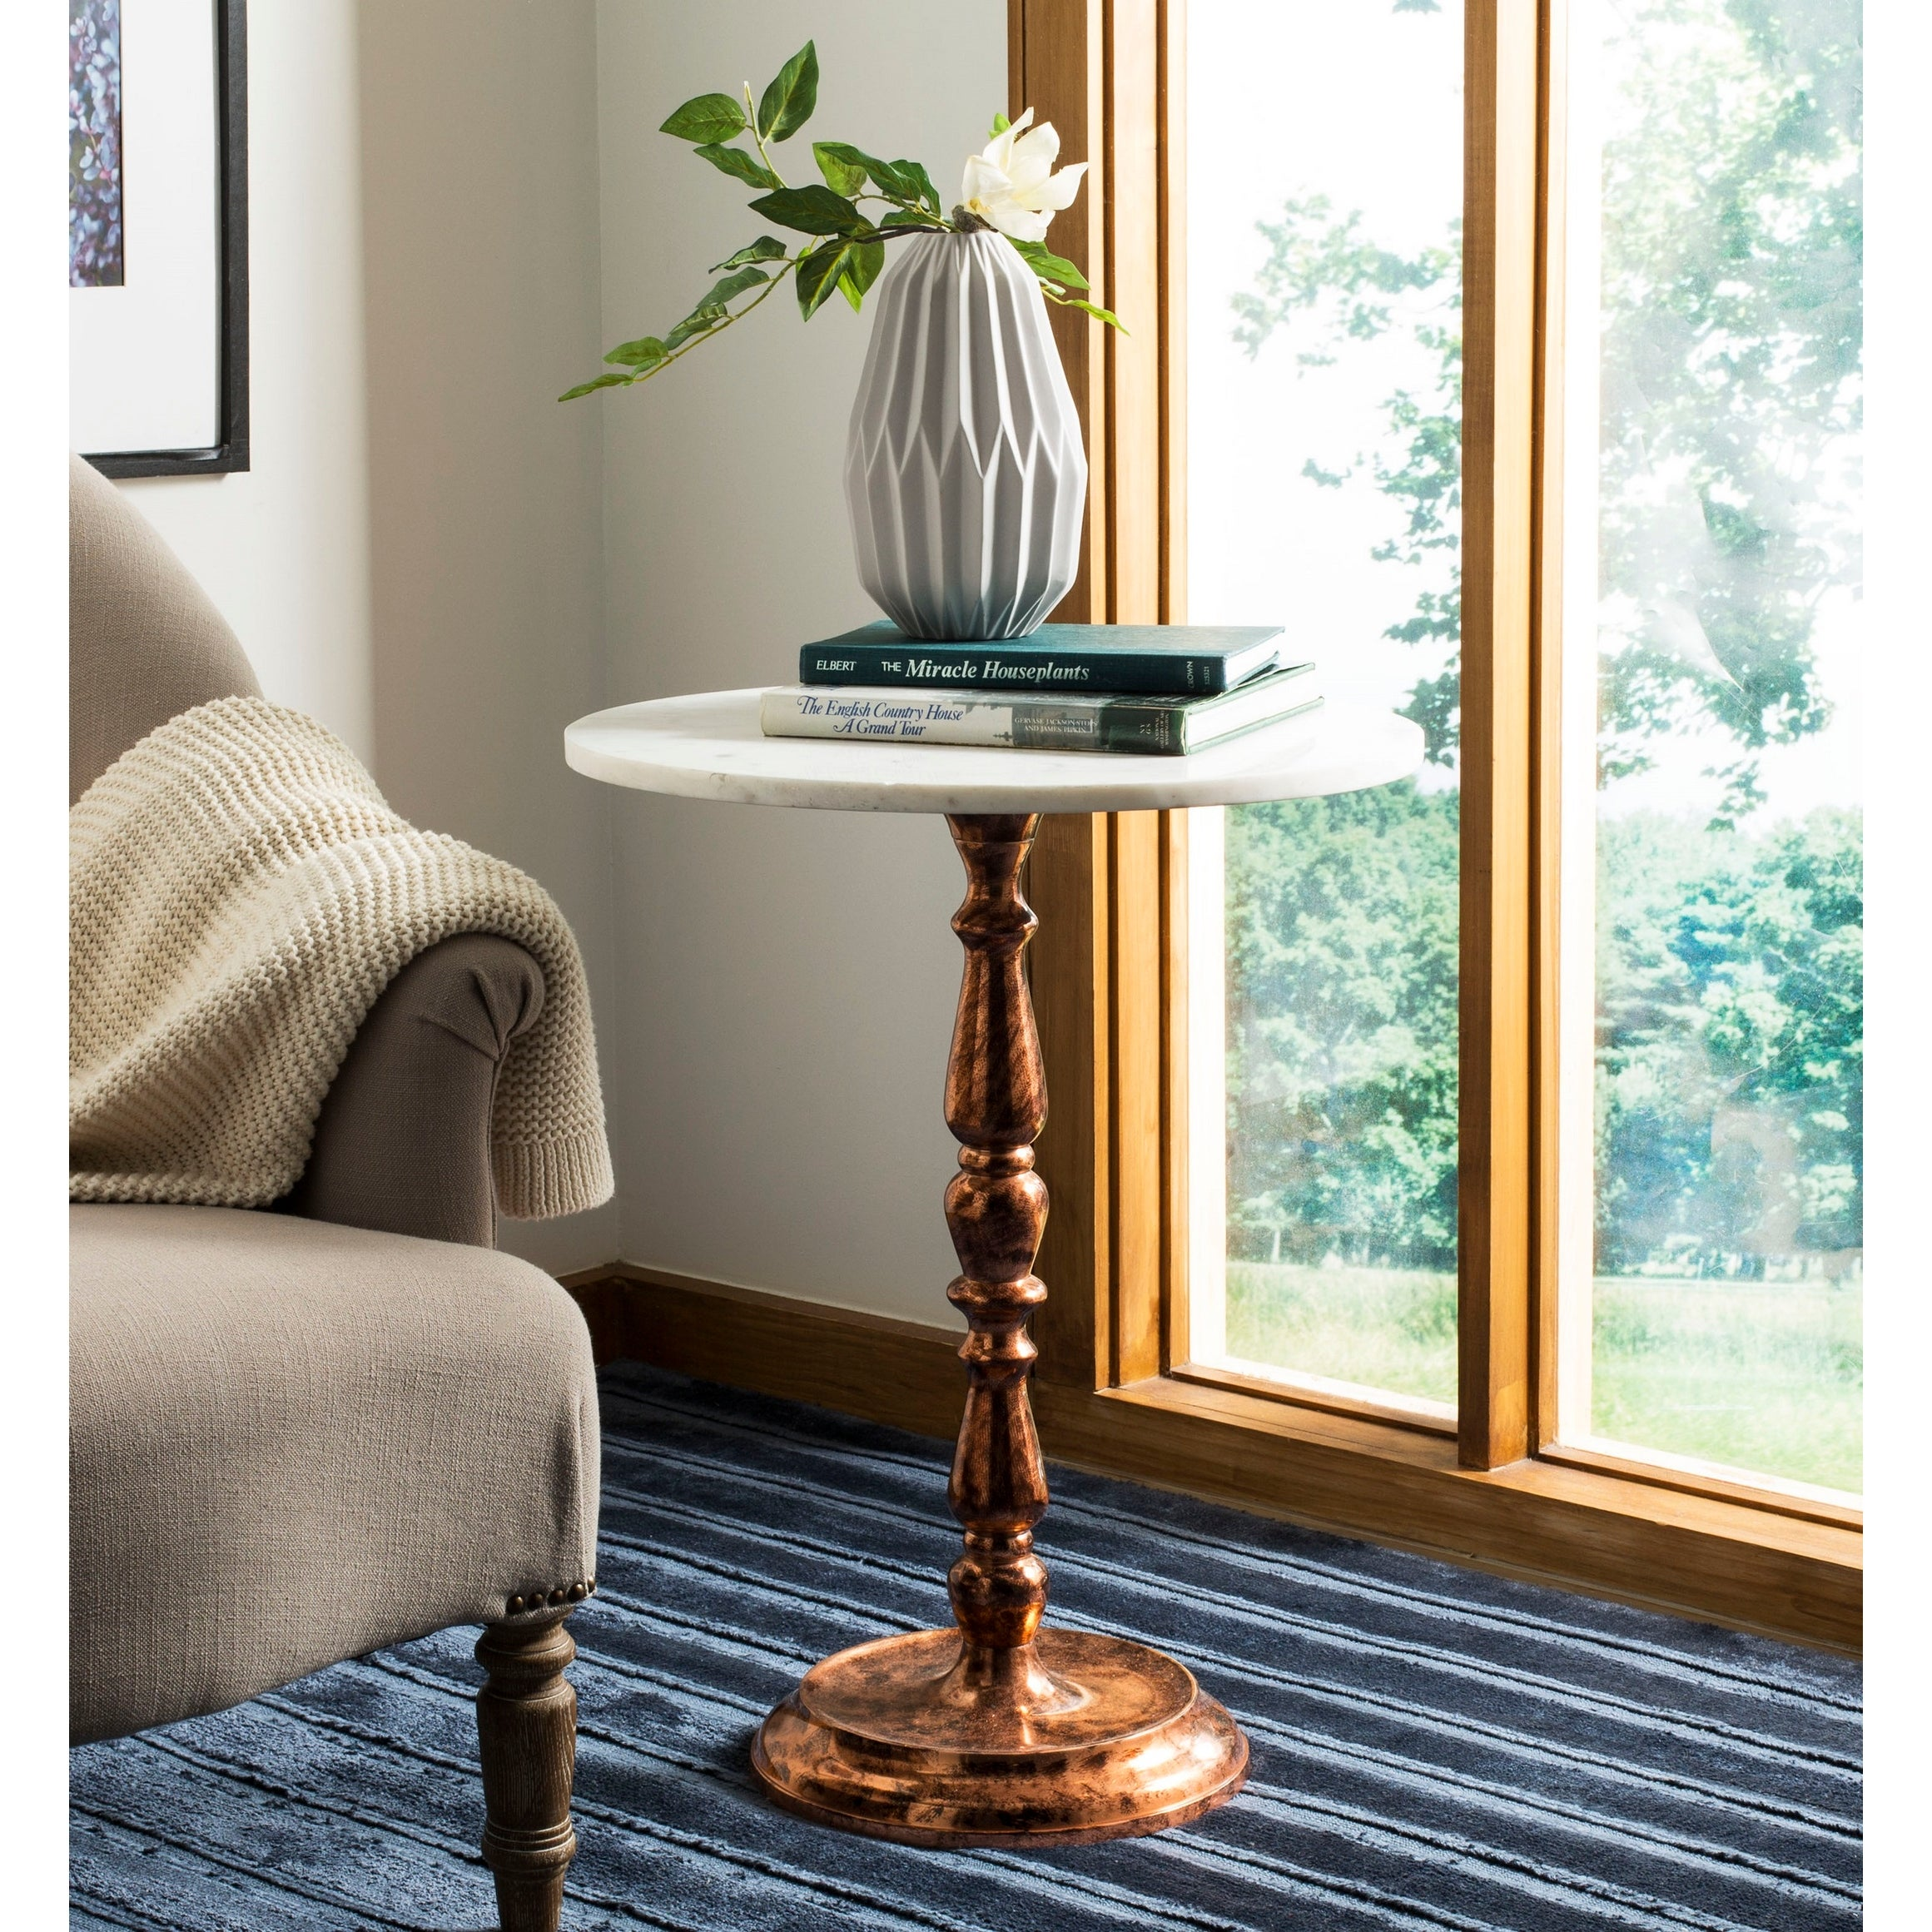 Safavieh Kiona Antique Copper White Marble Top Accent Table 20 X 20 X 24 Overstock 21185449